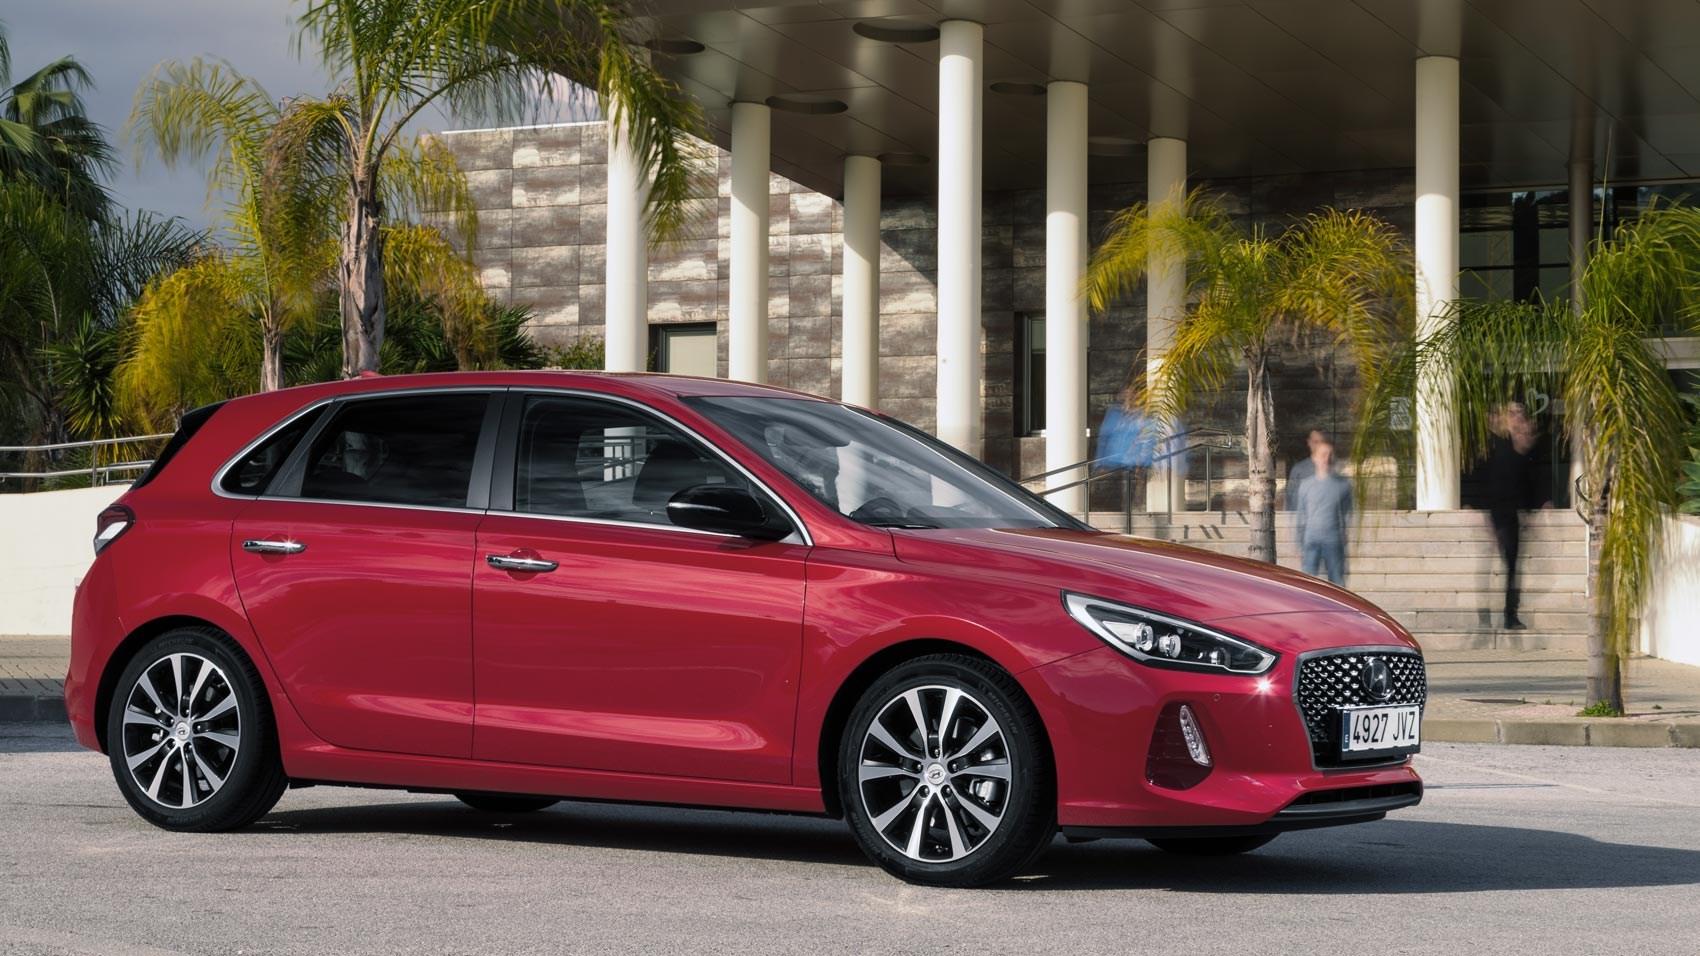 Hyundai Lease Deals >> Hyundai i30 1.4 T-GDi 140PS Premium (2017) review | CAR Magazine